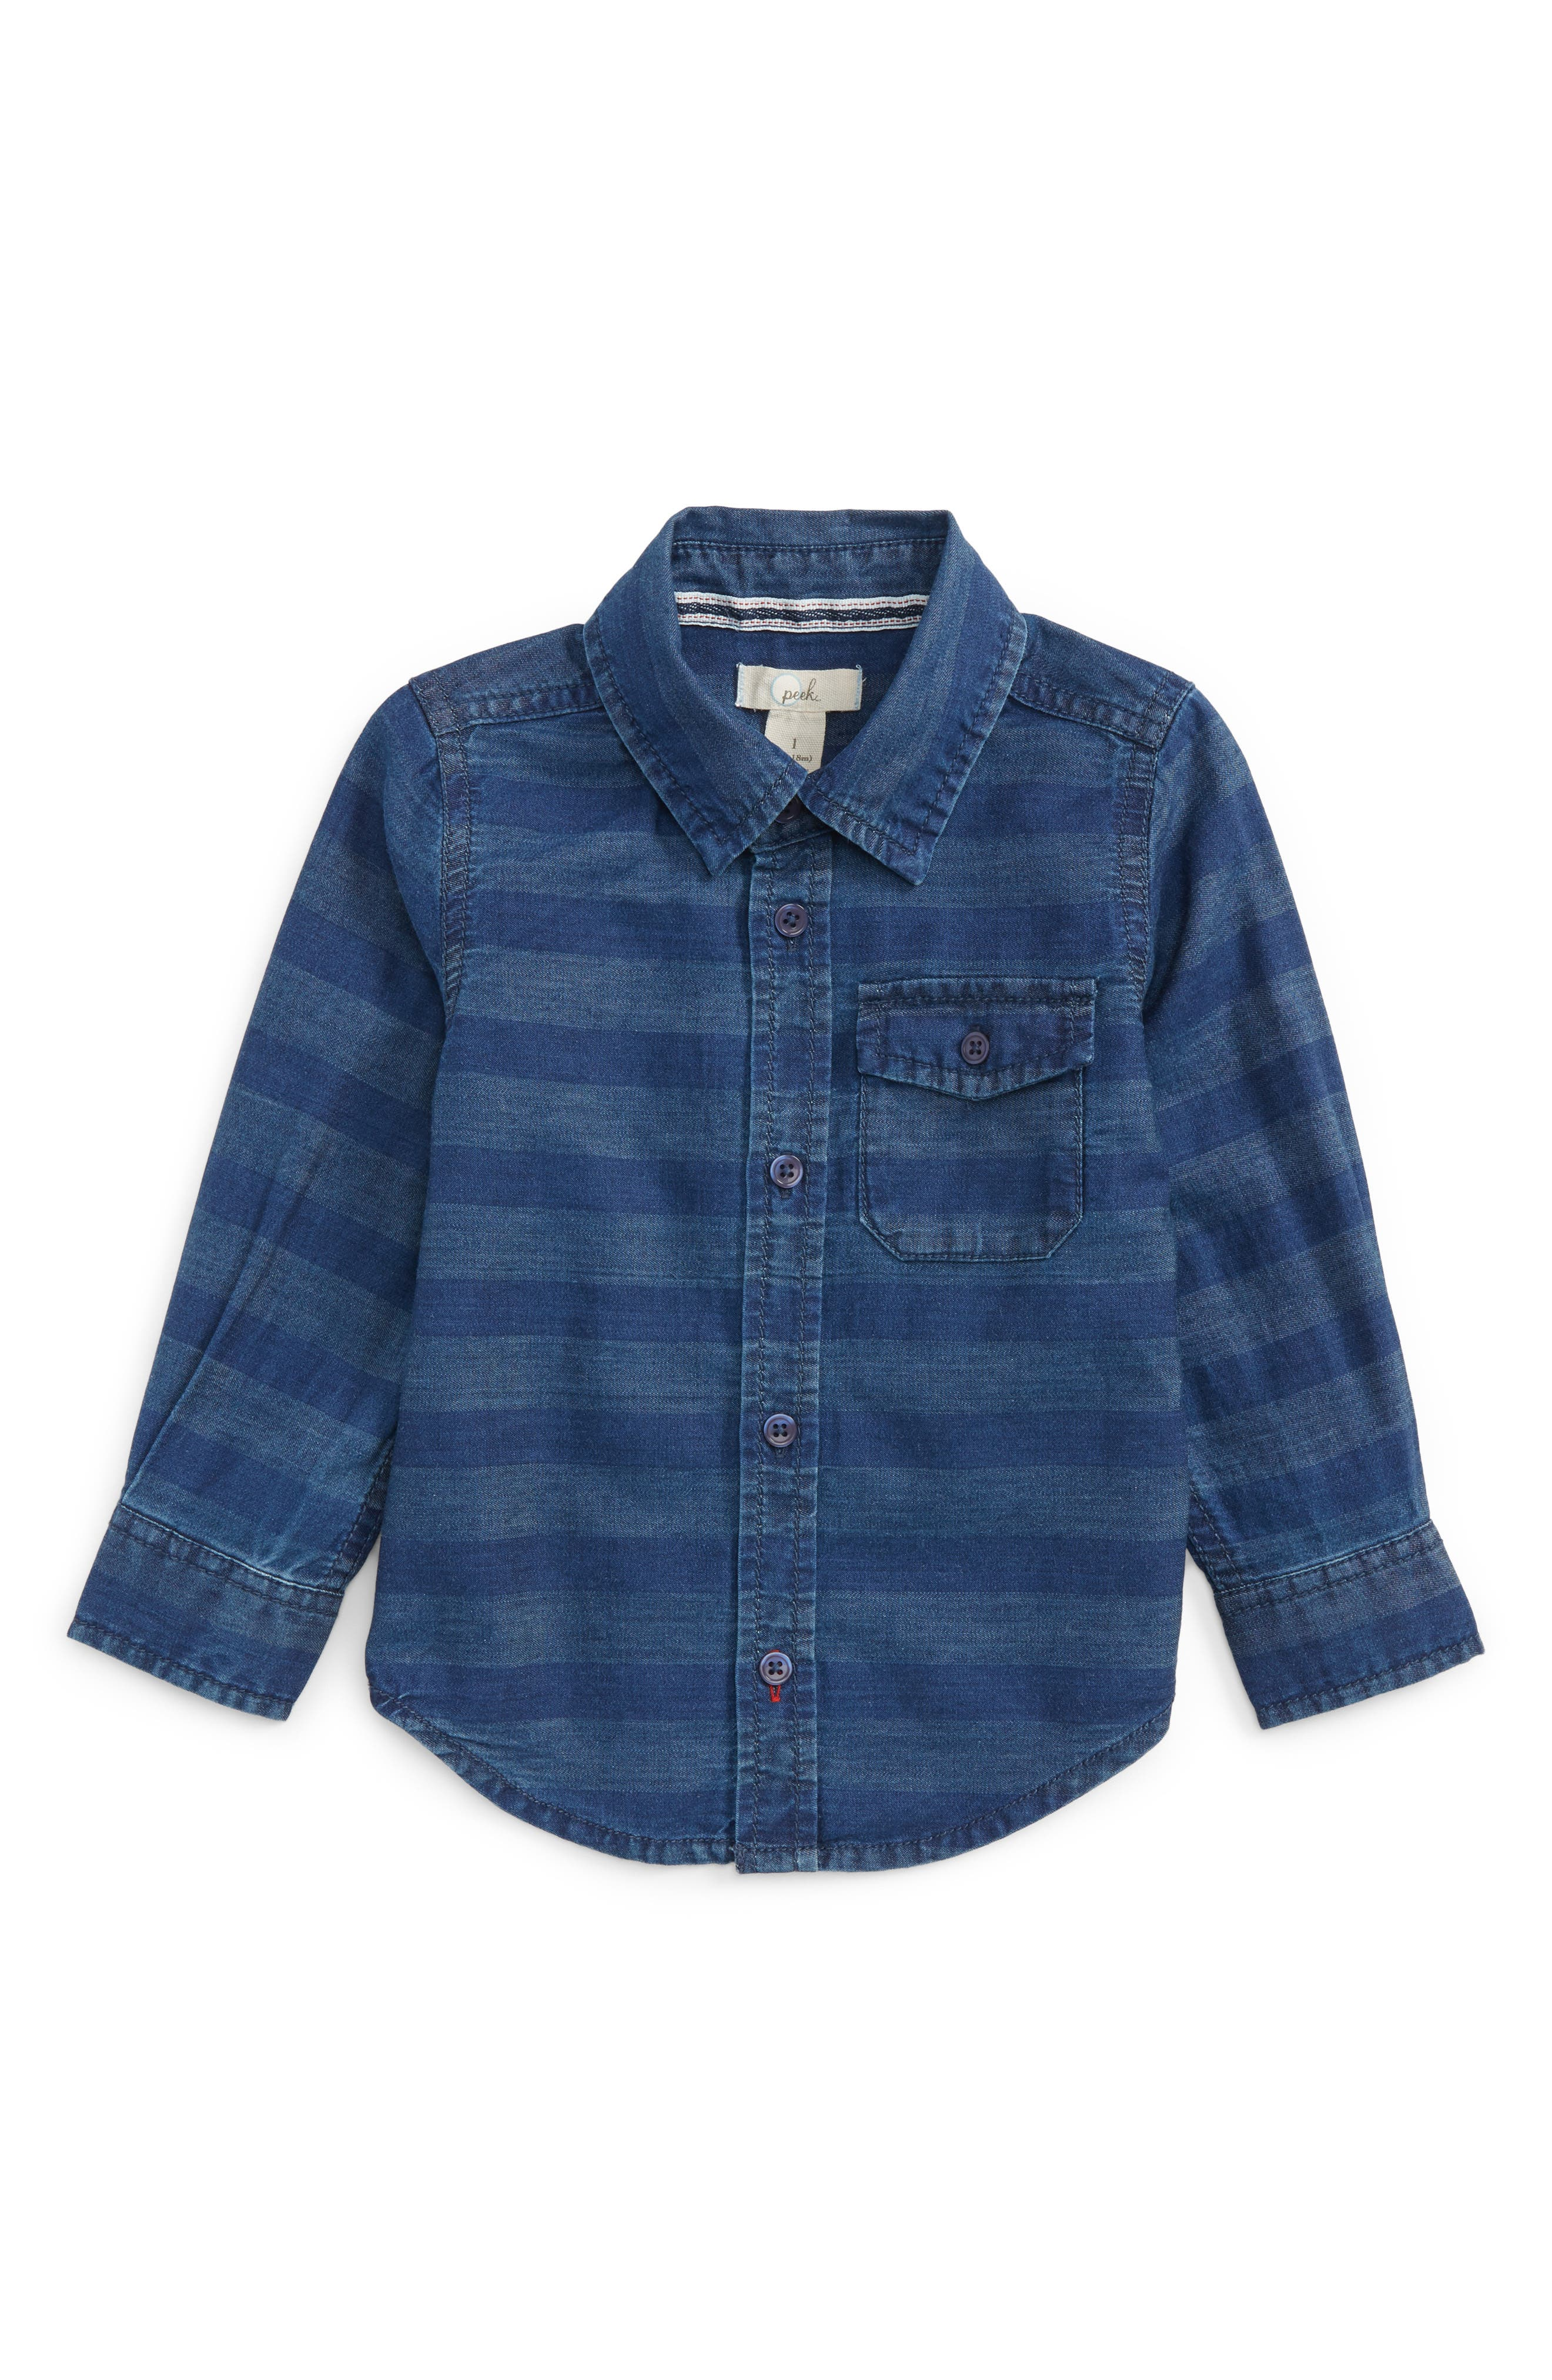 Alternate Image 1 Selected - Peek Aiden Stripe Chambray Shirt (Baby Boys)